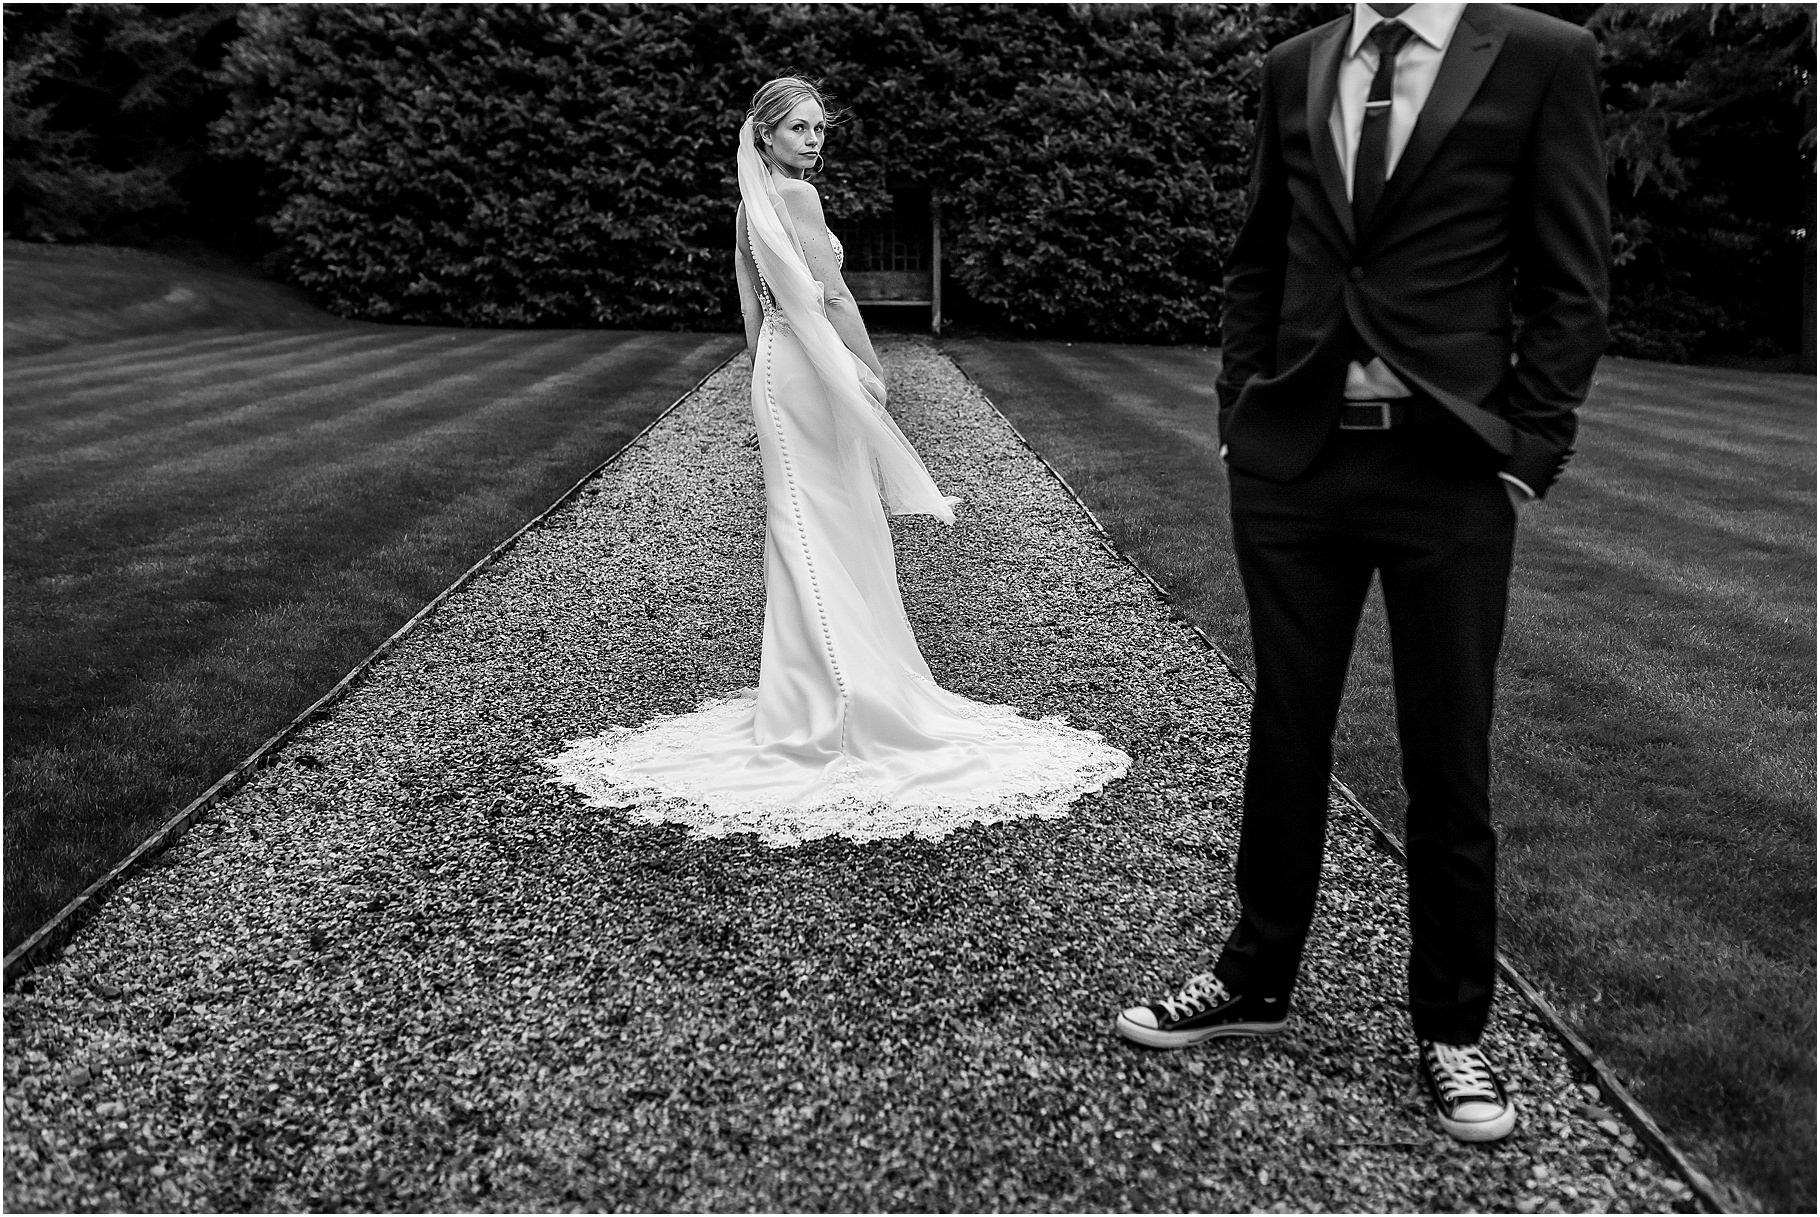 dan-wootton-photography-2017-weddings-155.jpg